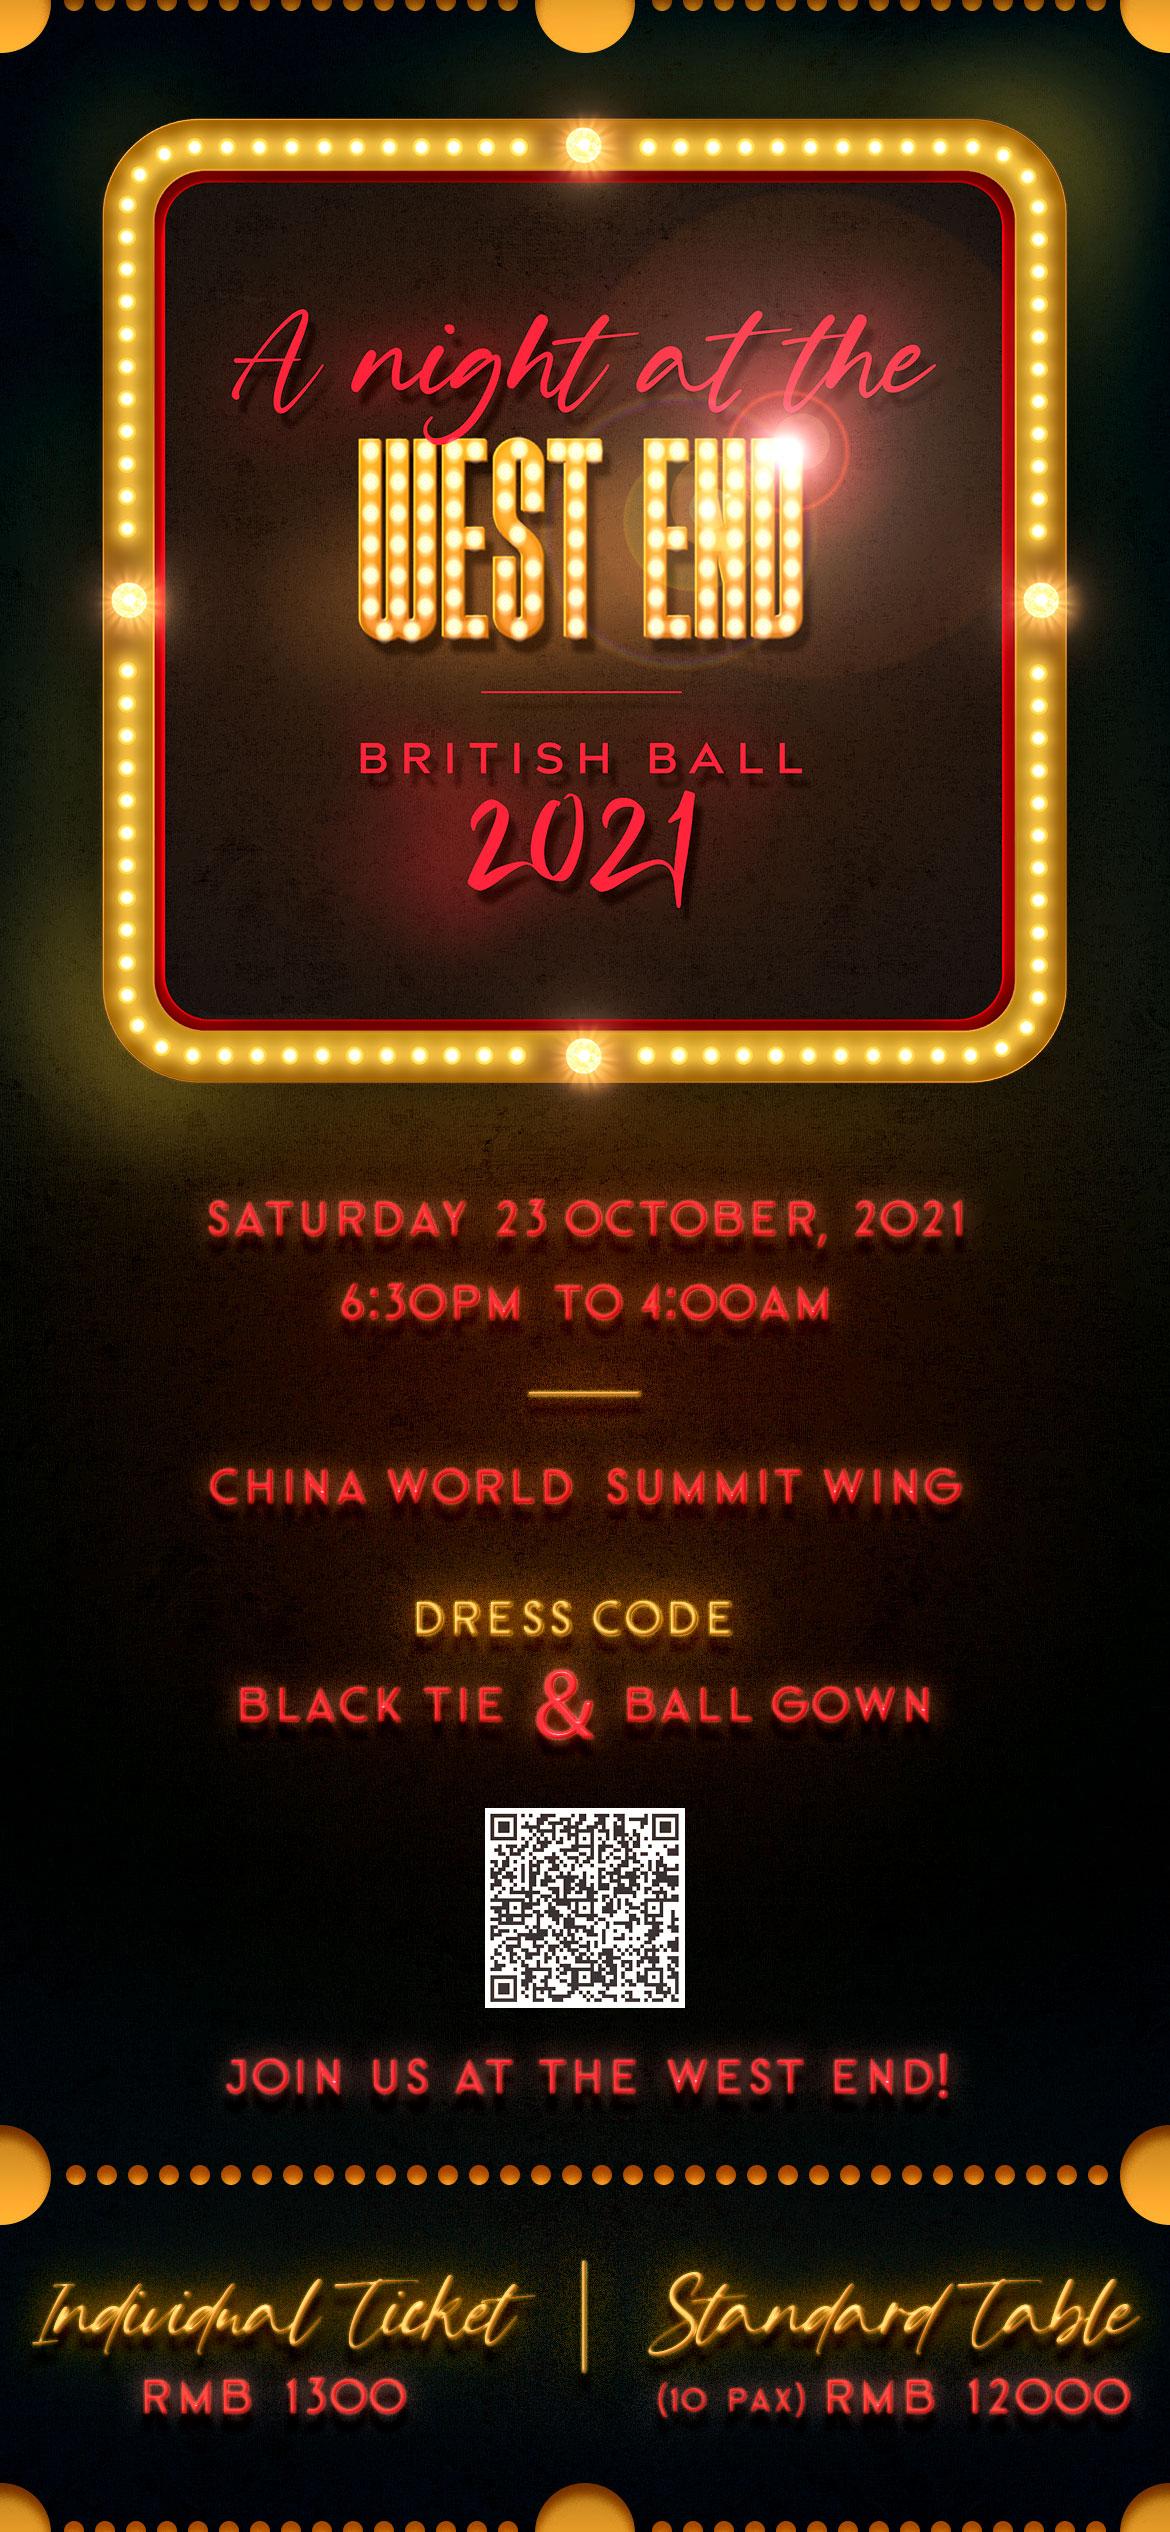 BritishBall_2021_Tickets